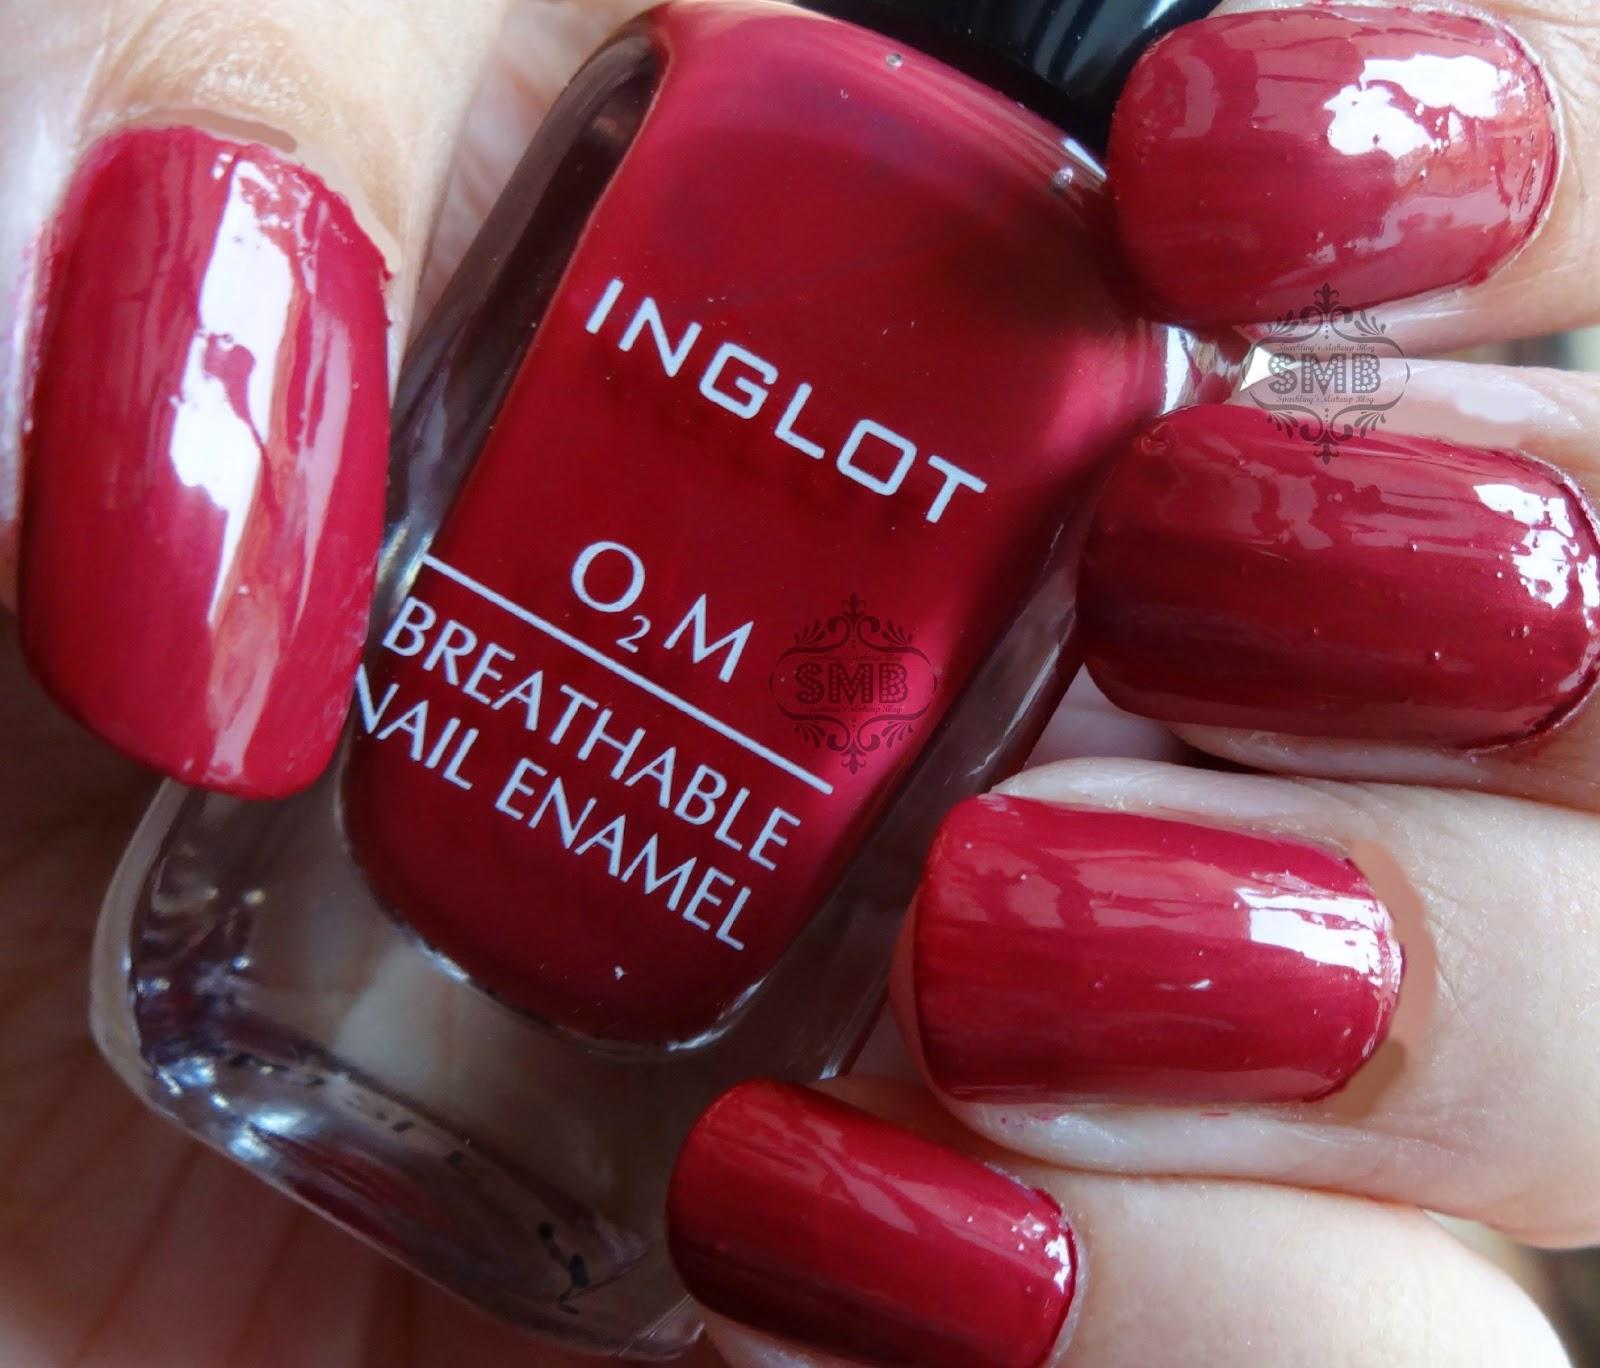 Inglot O2M breathable Nail Polish shade #689 | Sparkling Palette Blog